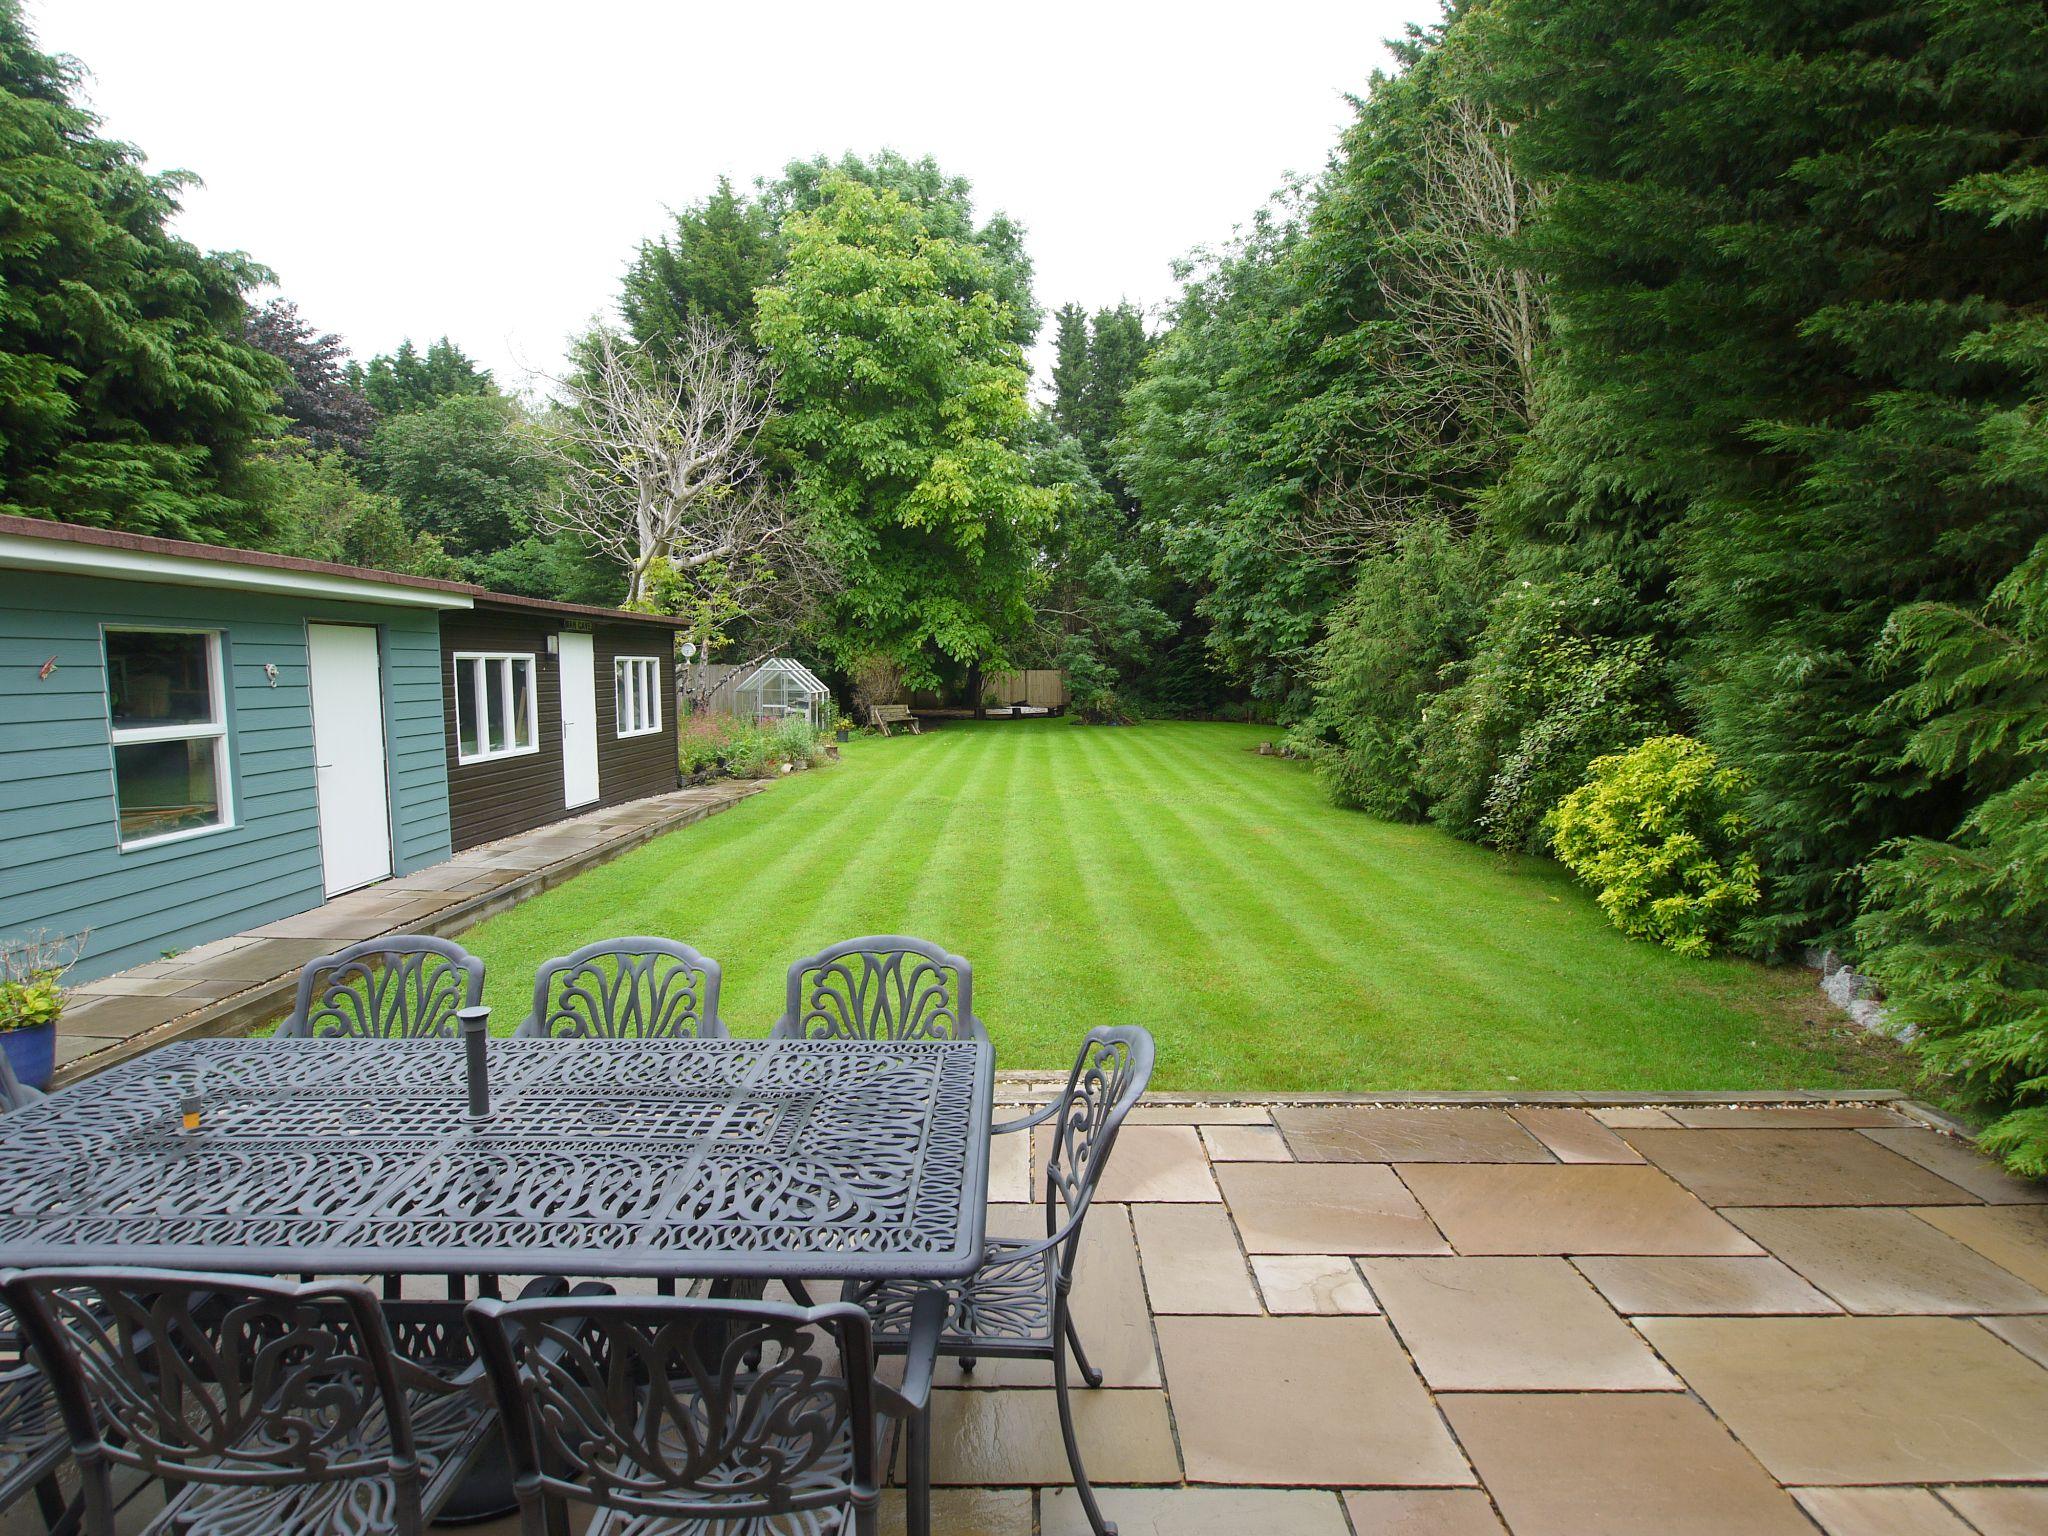 5 bedroom detached house Sold in Sevenoaks - Photograph 2